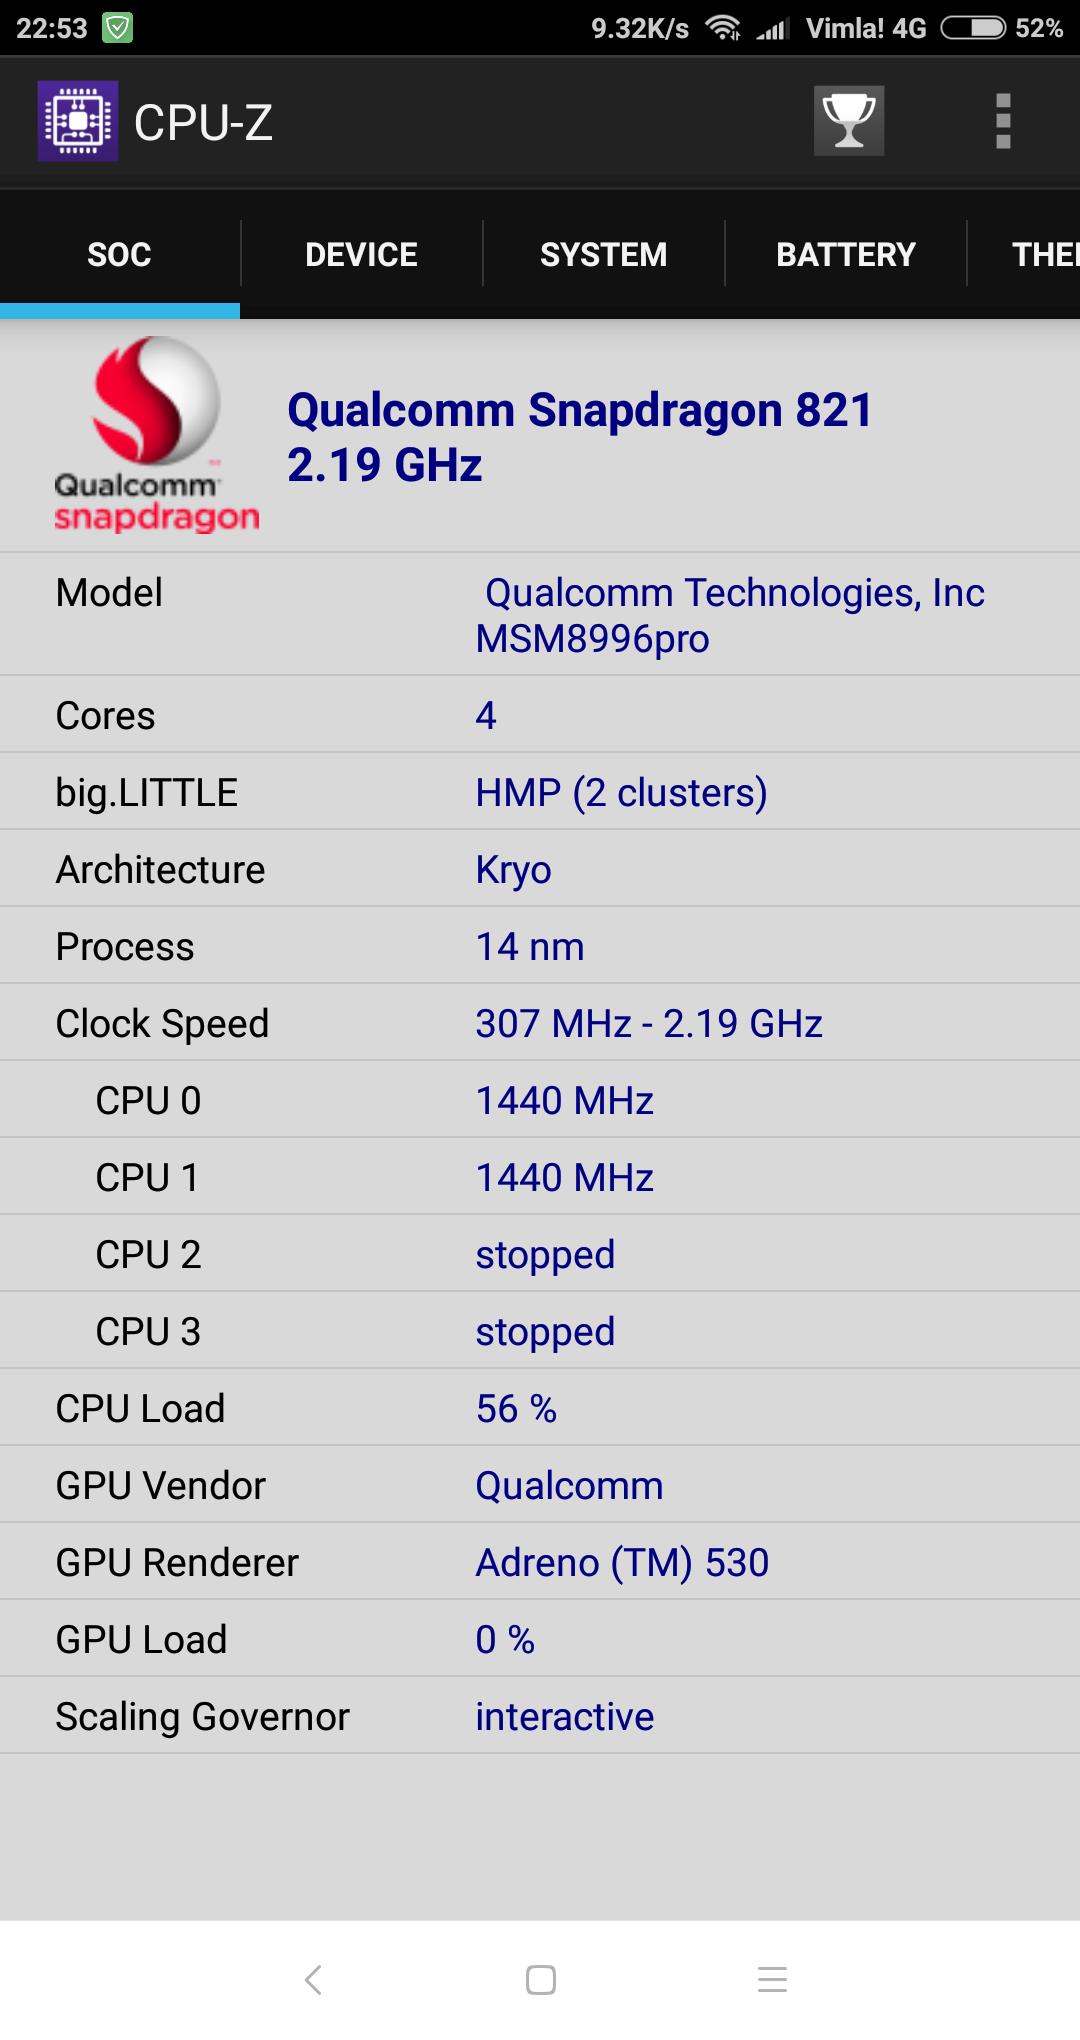 Screenshot_2018-07-08-22-53-56-278_com.cpuid.cpu_z.png